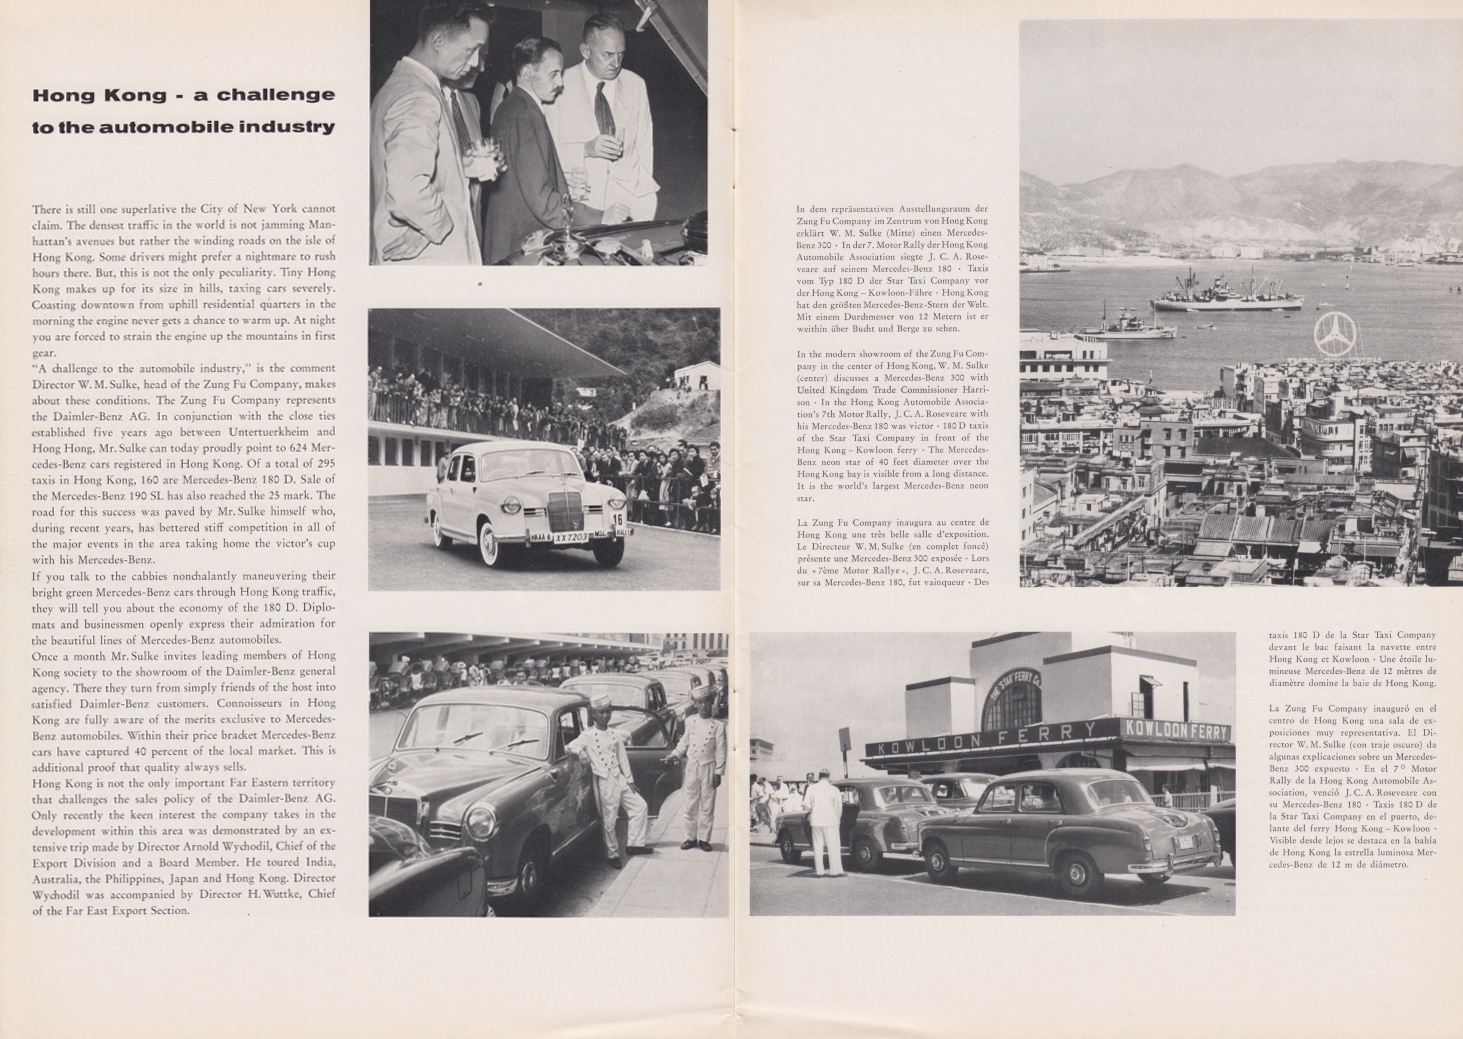 (REVISTA): Periódico In aller welt n.º 29 - Mercedes-Benz no mundo - 1959 - multilingue 004